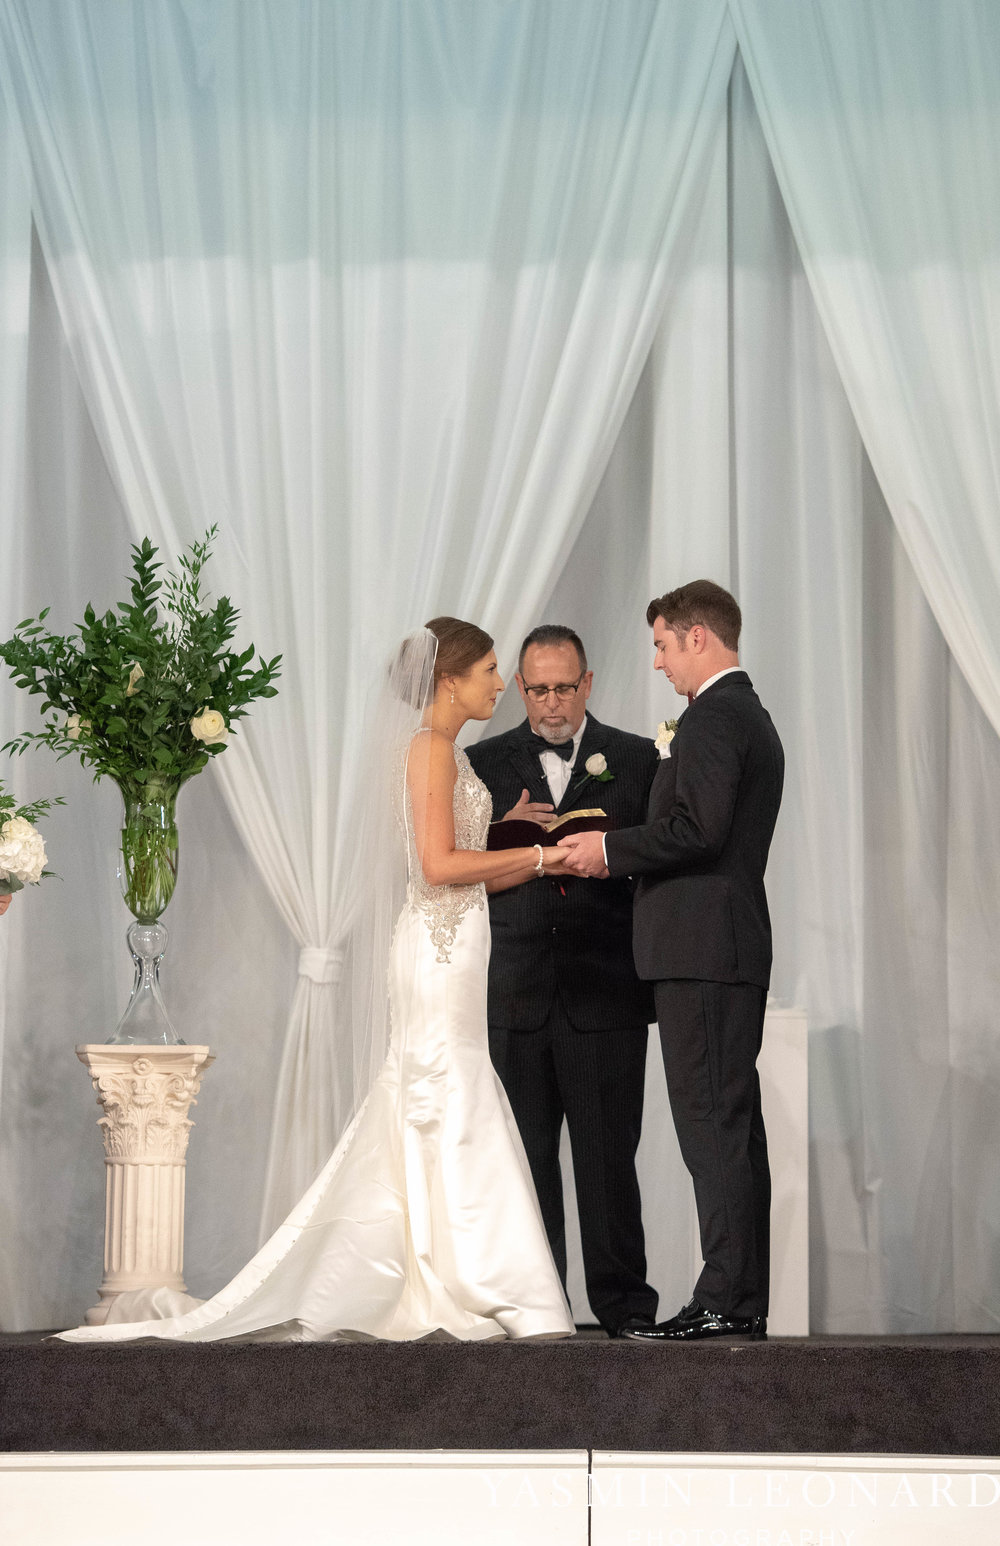 Millennium Center Wedding - Downtown Winston Salem - Winston Salem Wedding Photographer - Winston Salem Venues - Indoor Wedding Venues - NC Wedding Photographer - Yasmin Leonard Photography-41.jpg